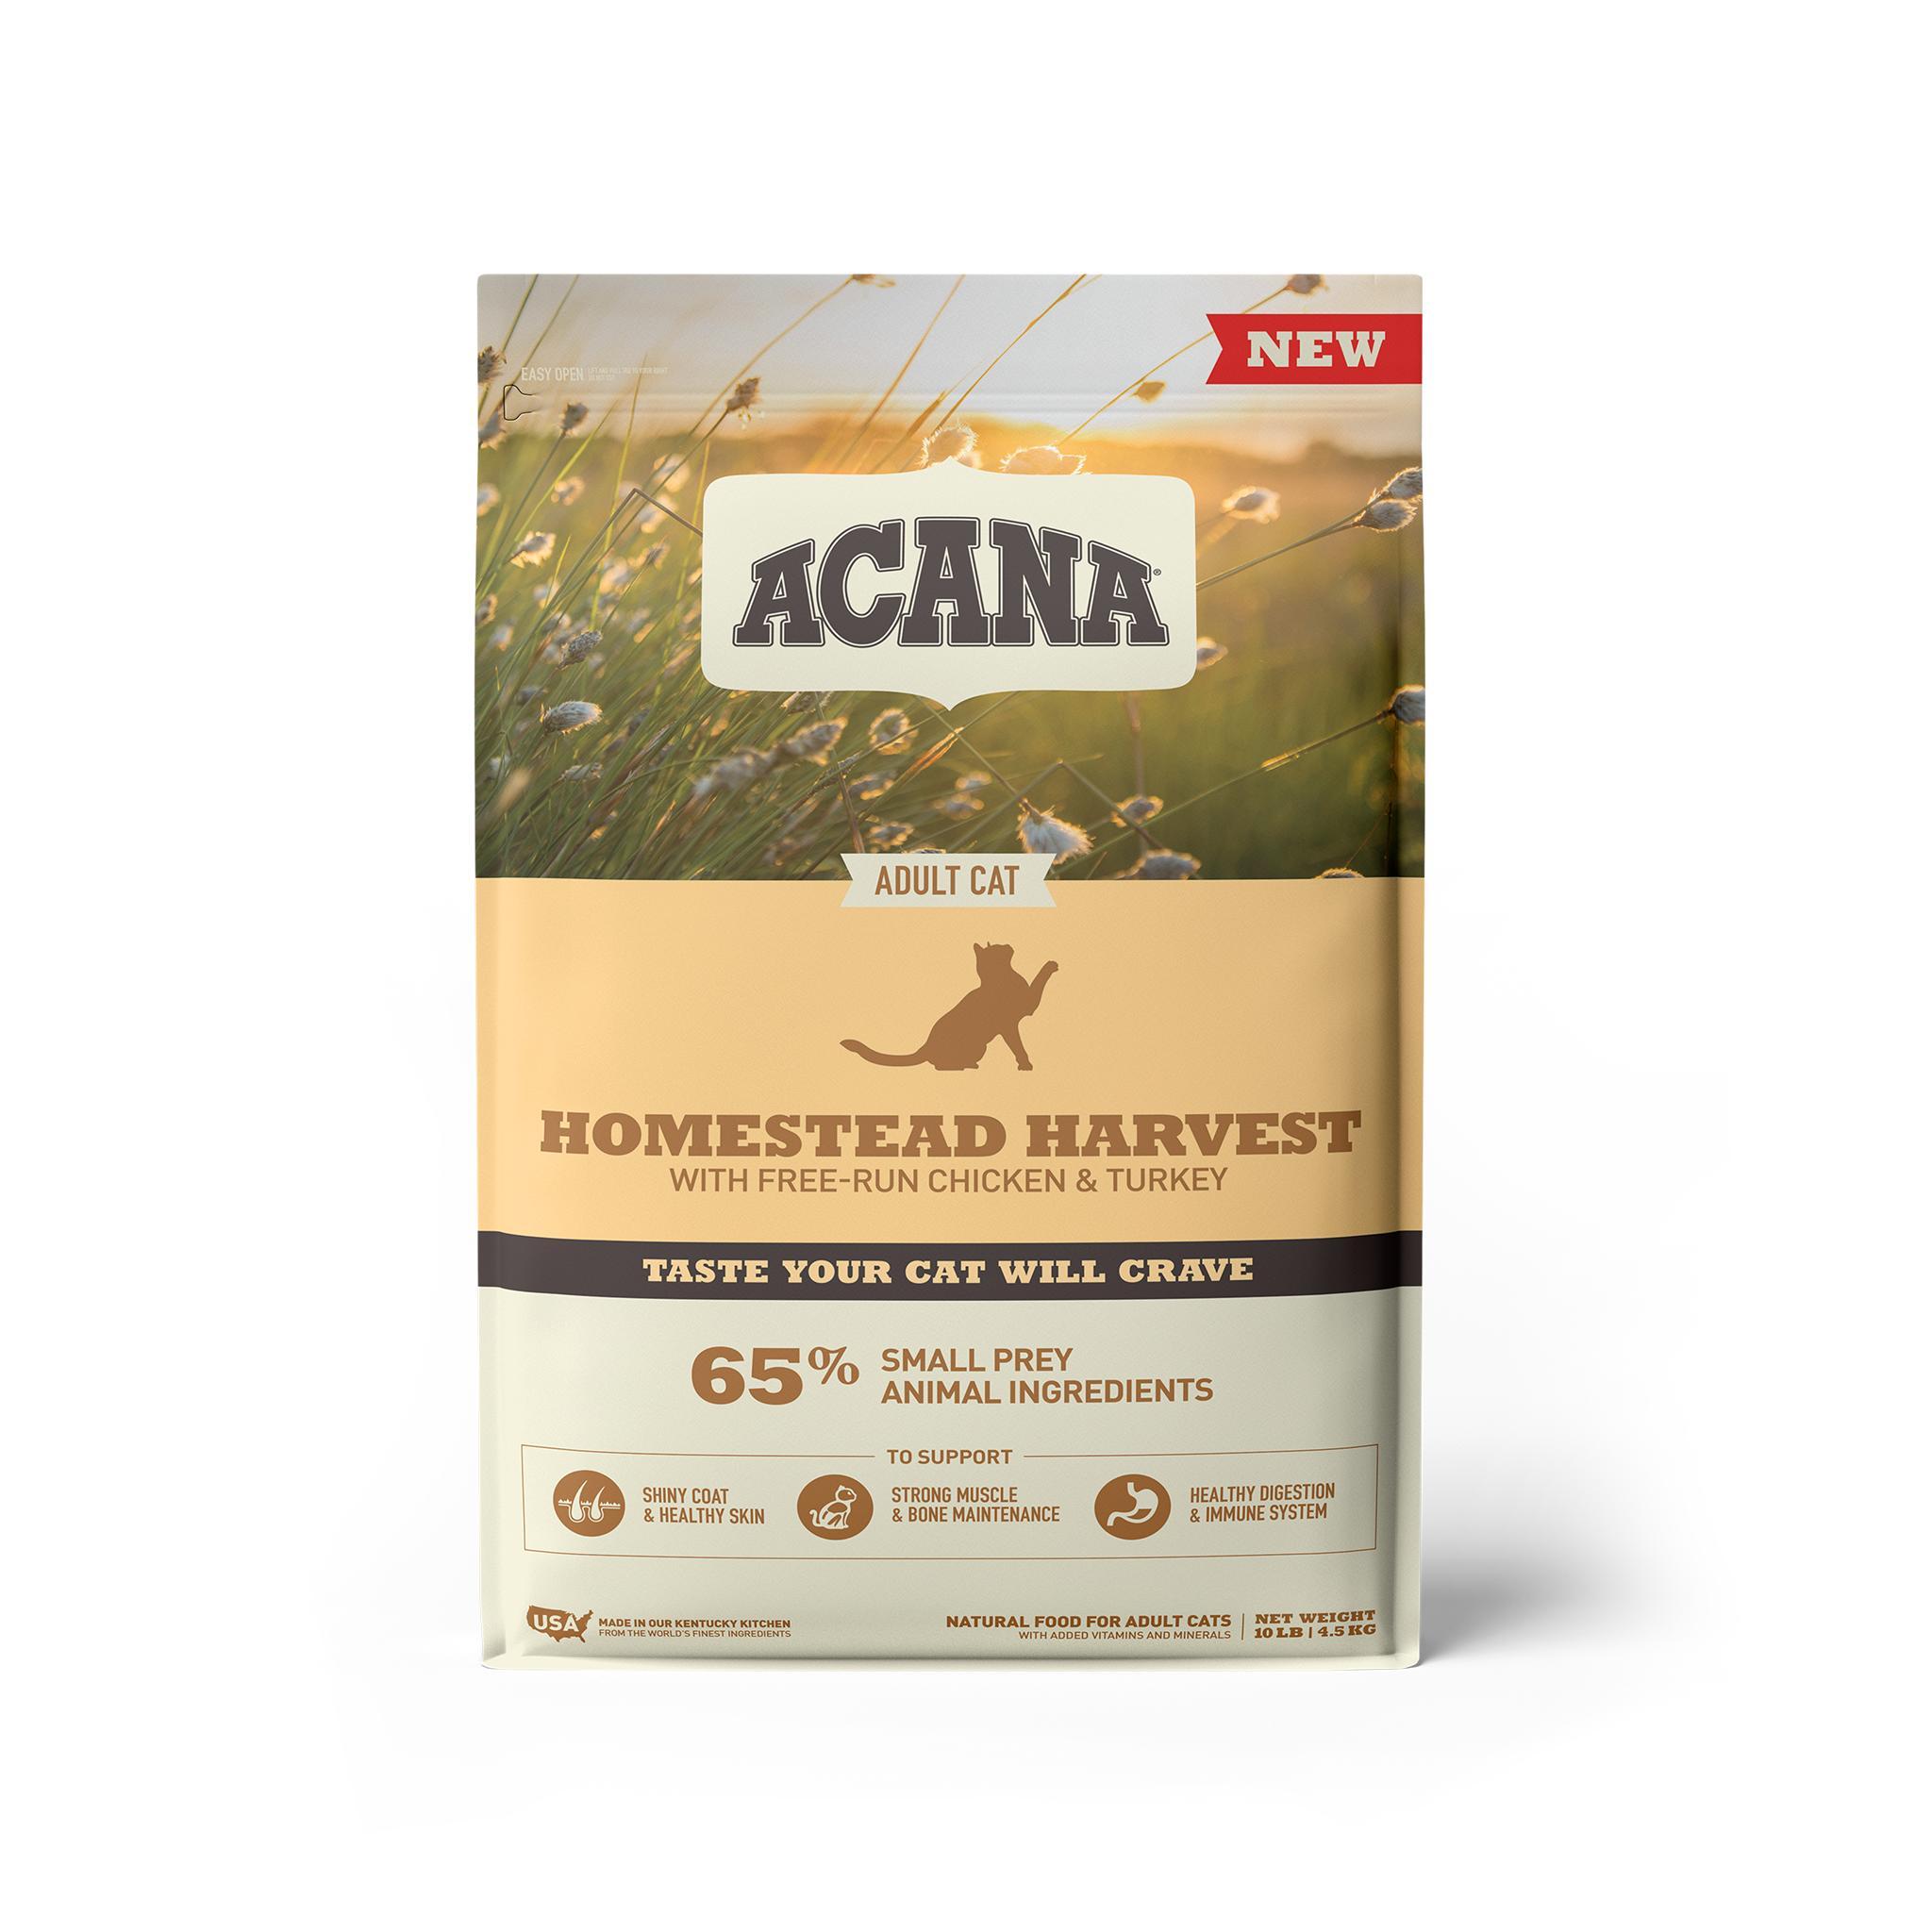 ACANA Homestead Harvest Dry Cat Food, 10-lb